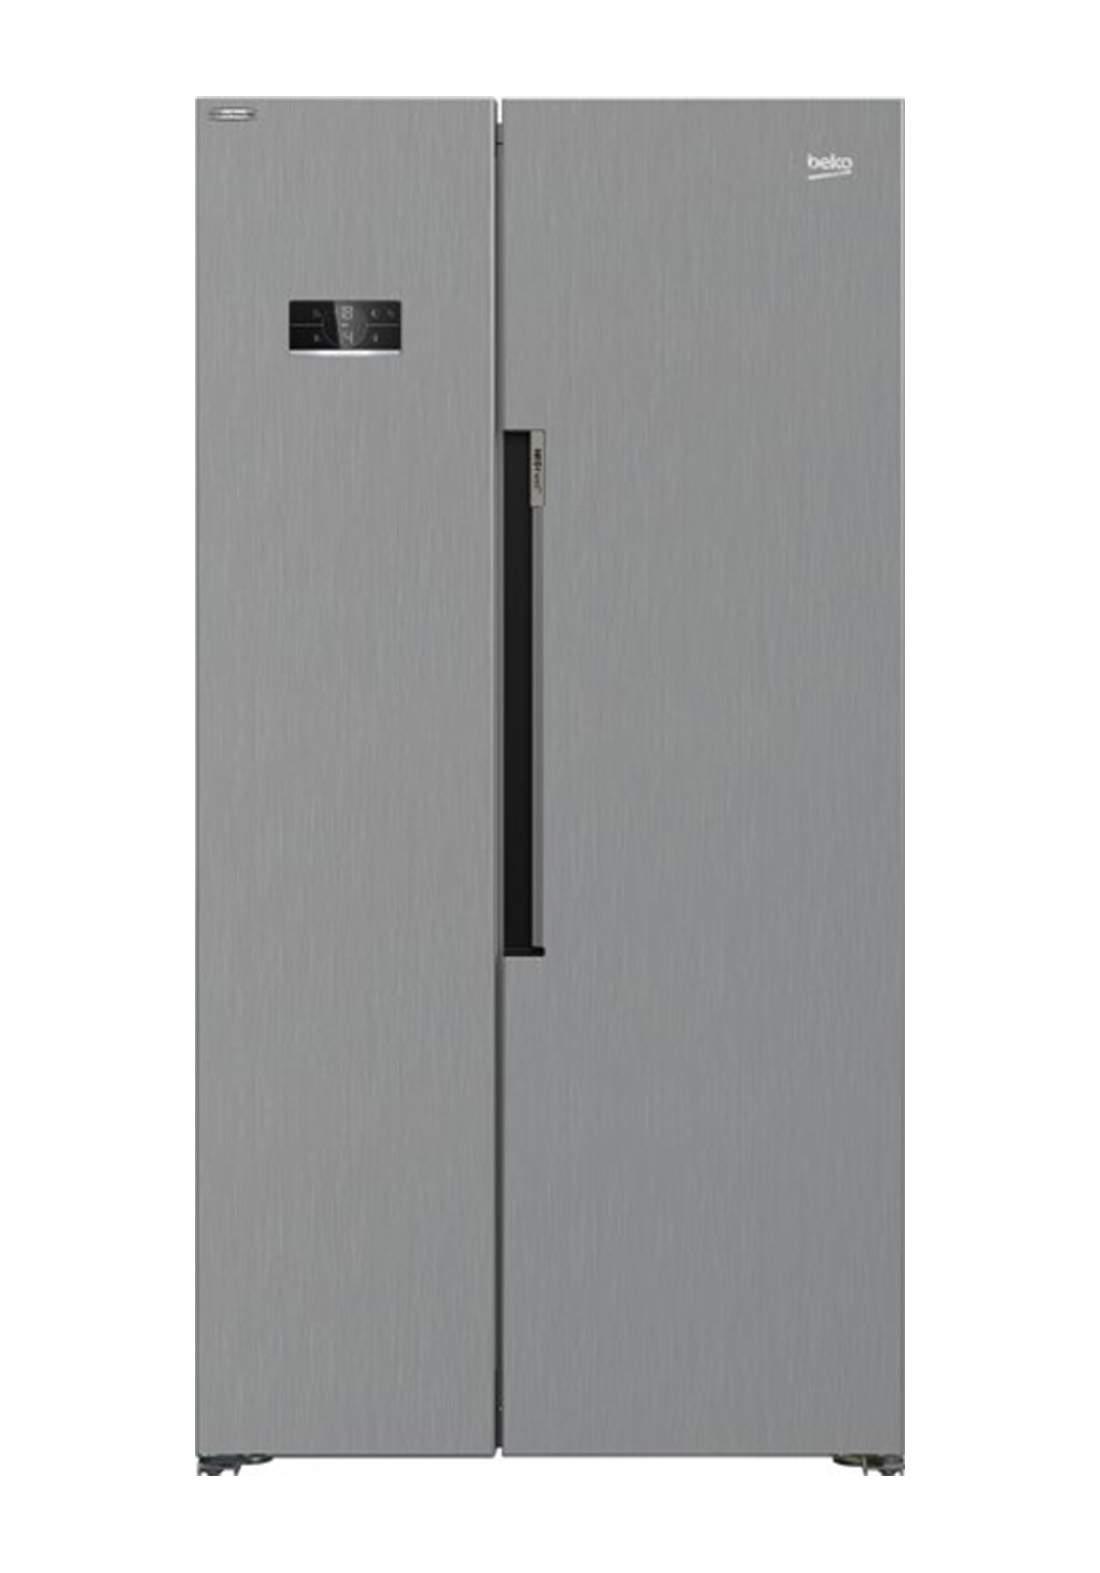 Beko GN 164020 XP Refrigerator 640 L - Gray